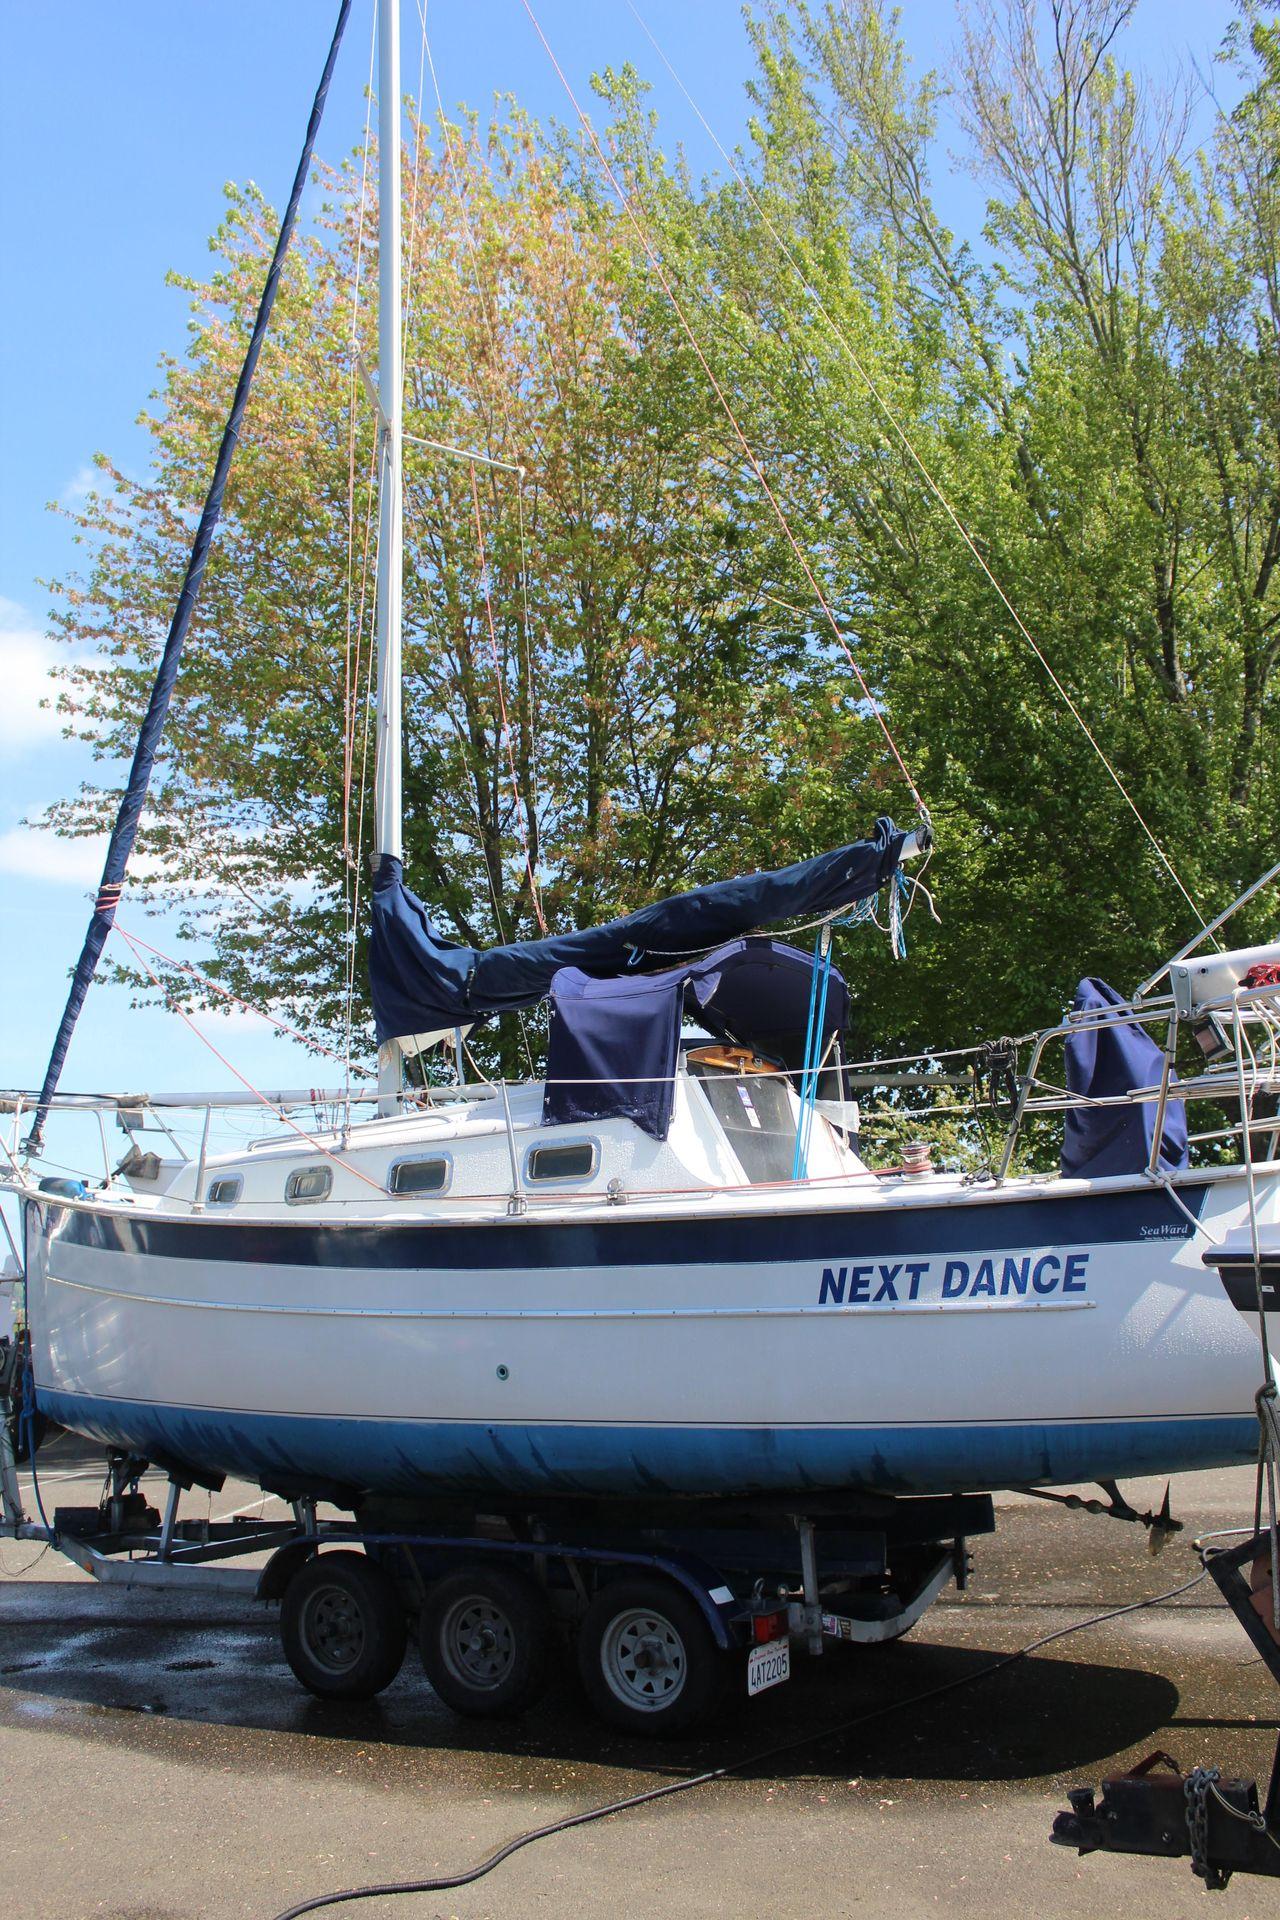 1999 Used Seaward 25 Cruiser Sailboat For Sale - $24,900